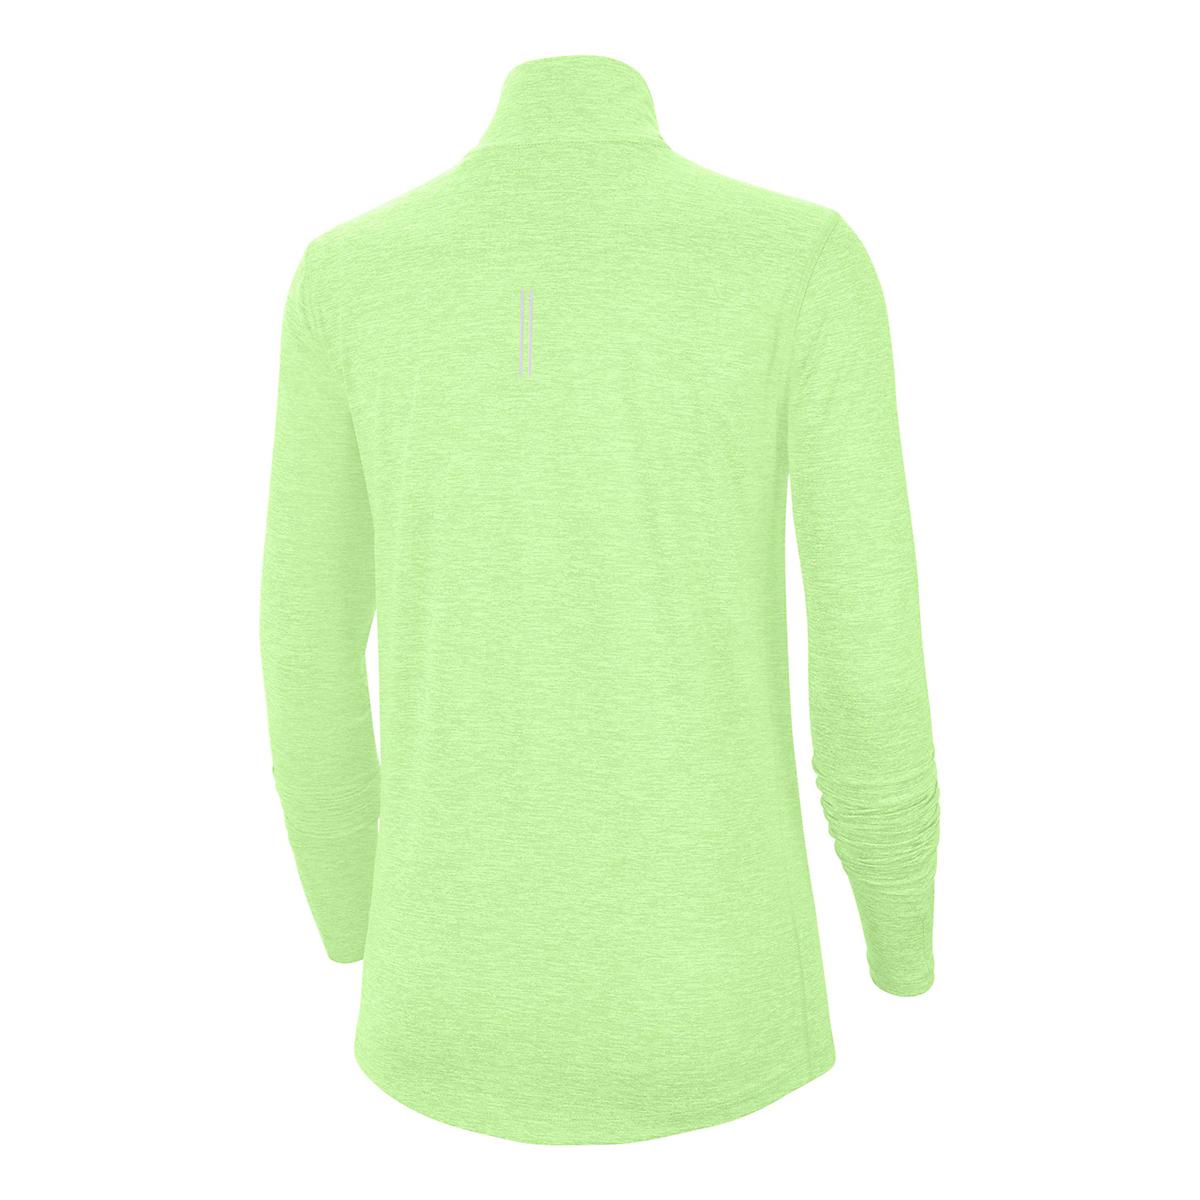 Women's Nike Element Top 1/2 Zip Long Sleeve - Color: Volt/Barely Volt/Htr/Reflective Silver - Size: XS, Volt/Barely Volt/Htr/Reflective Silver, large, image 3